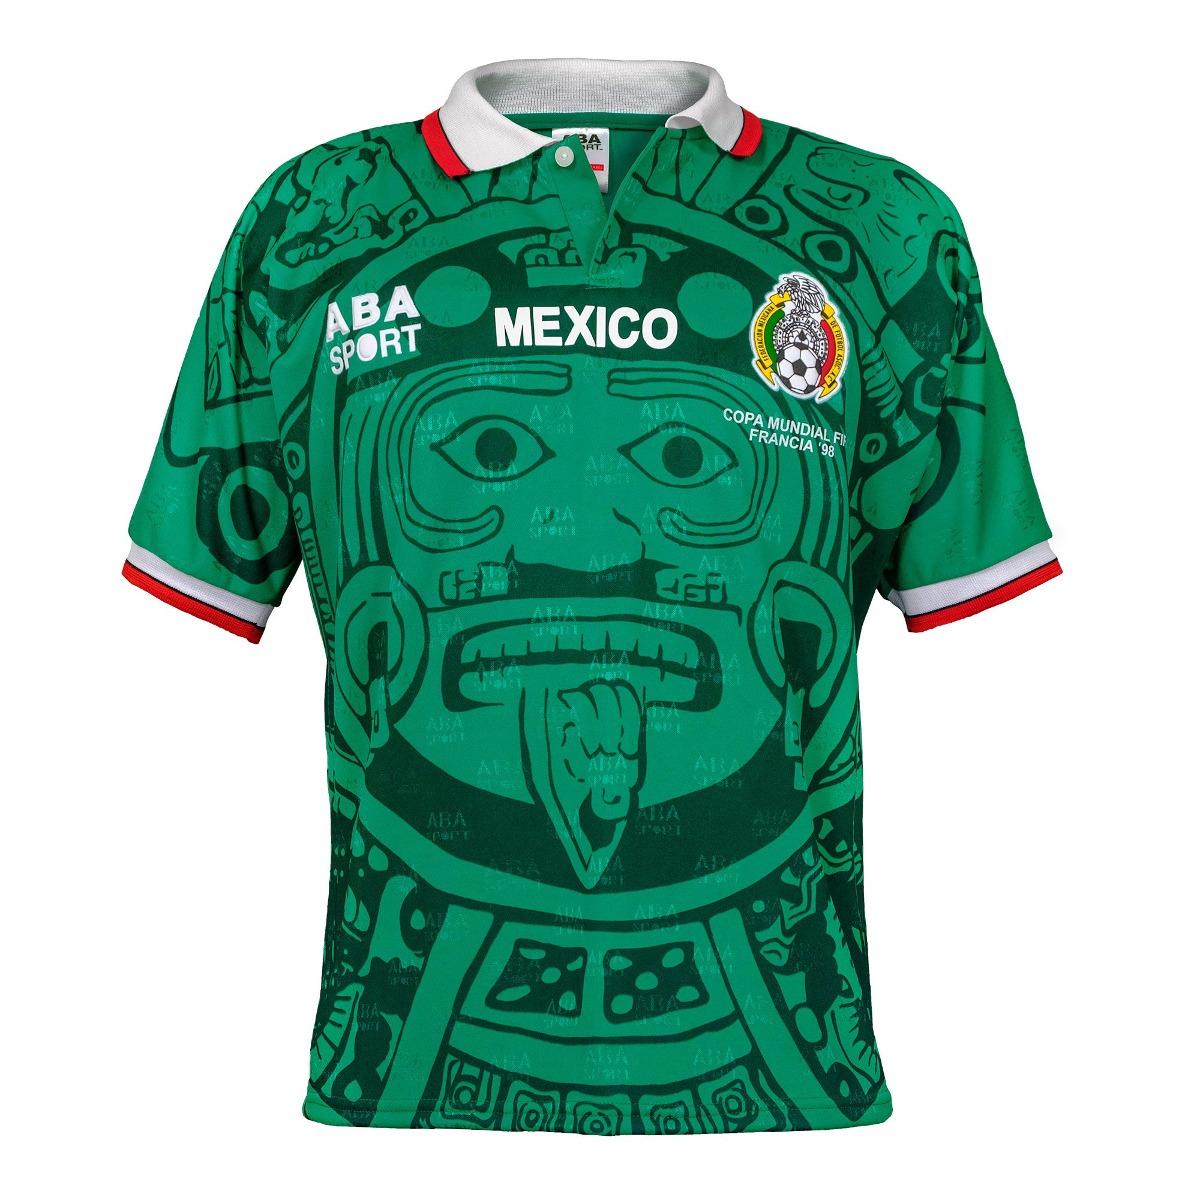 6da9faa9539 aba sport mexico auténtico 1998 world cup soccer jersey gre. Cargando zoom.